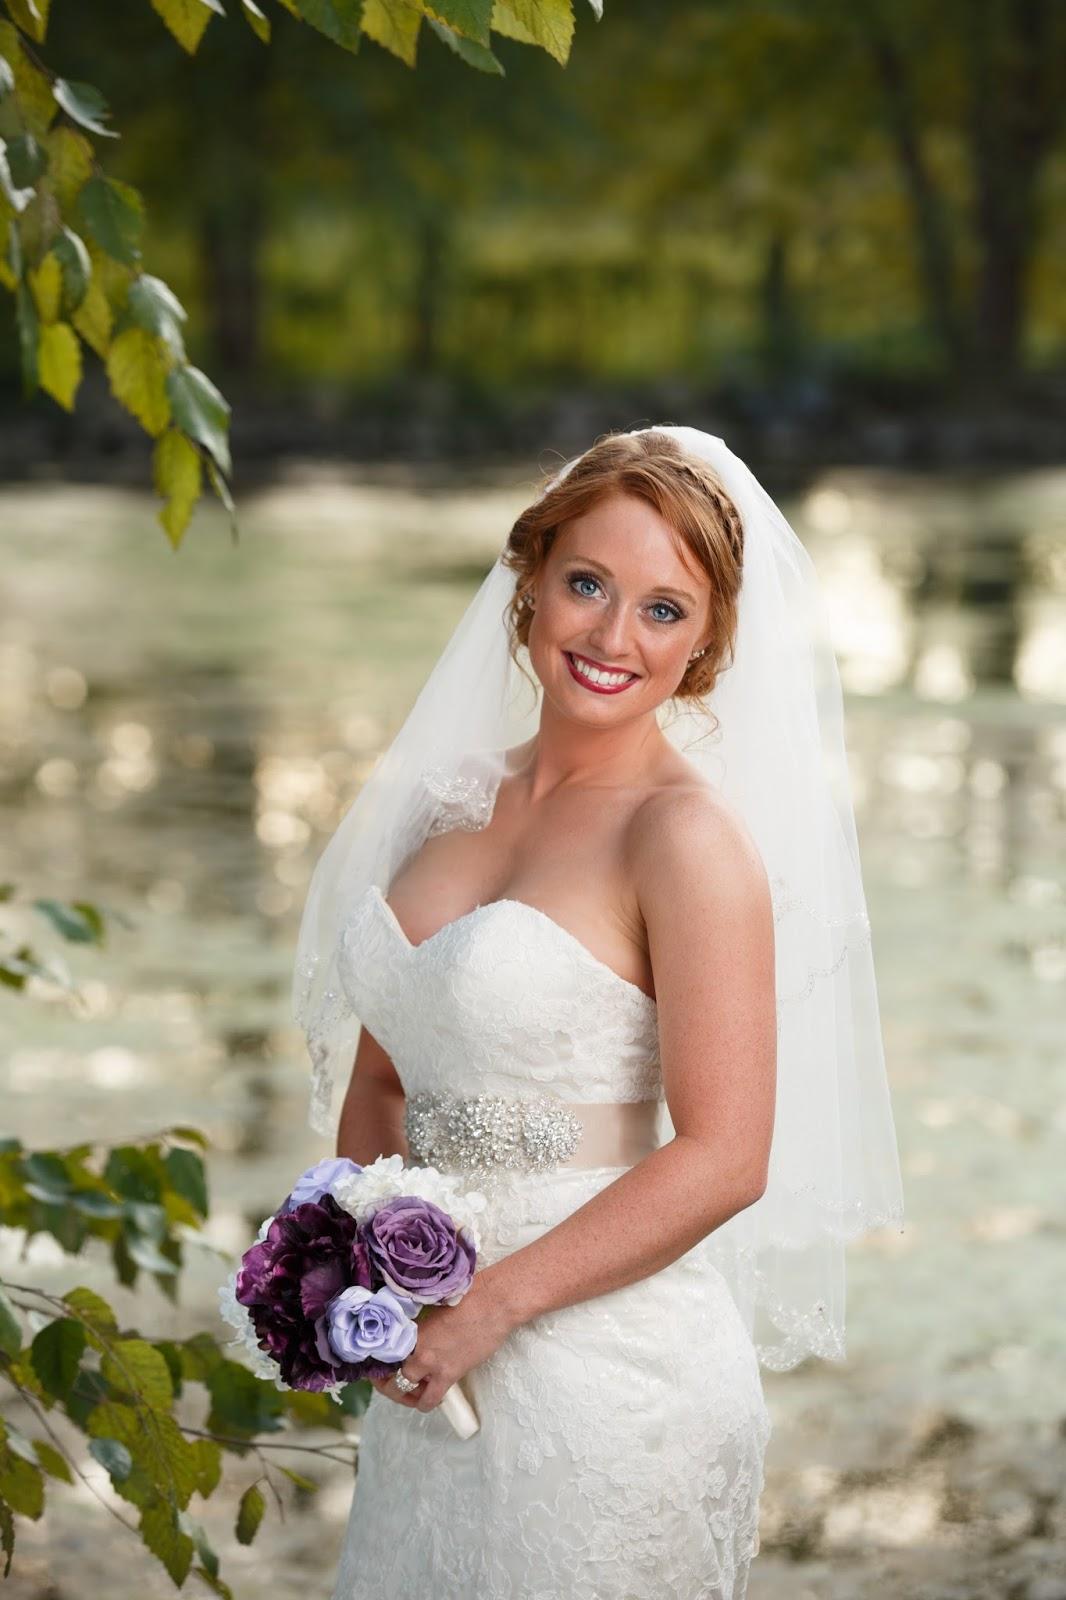 Cable Photography & Video: Amanda Rabon Davis - Wedding Photography ...